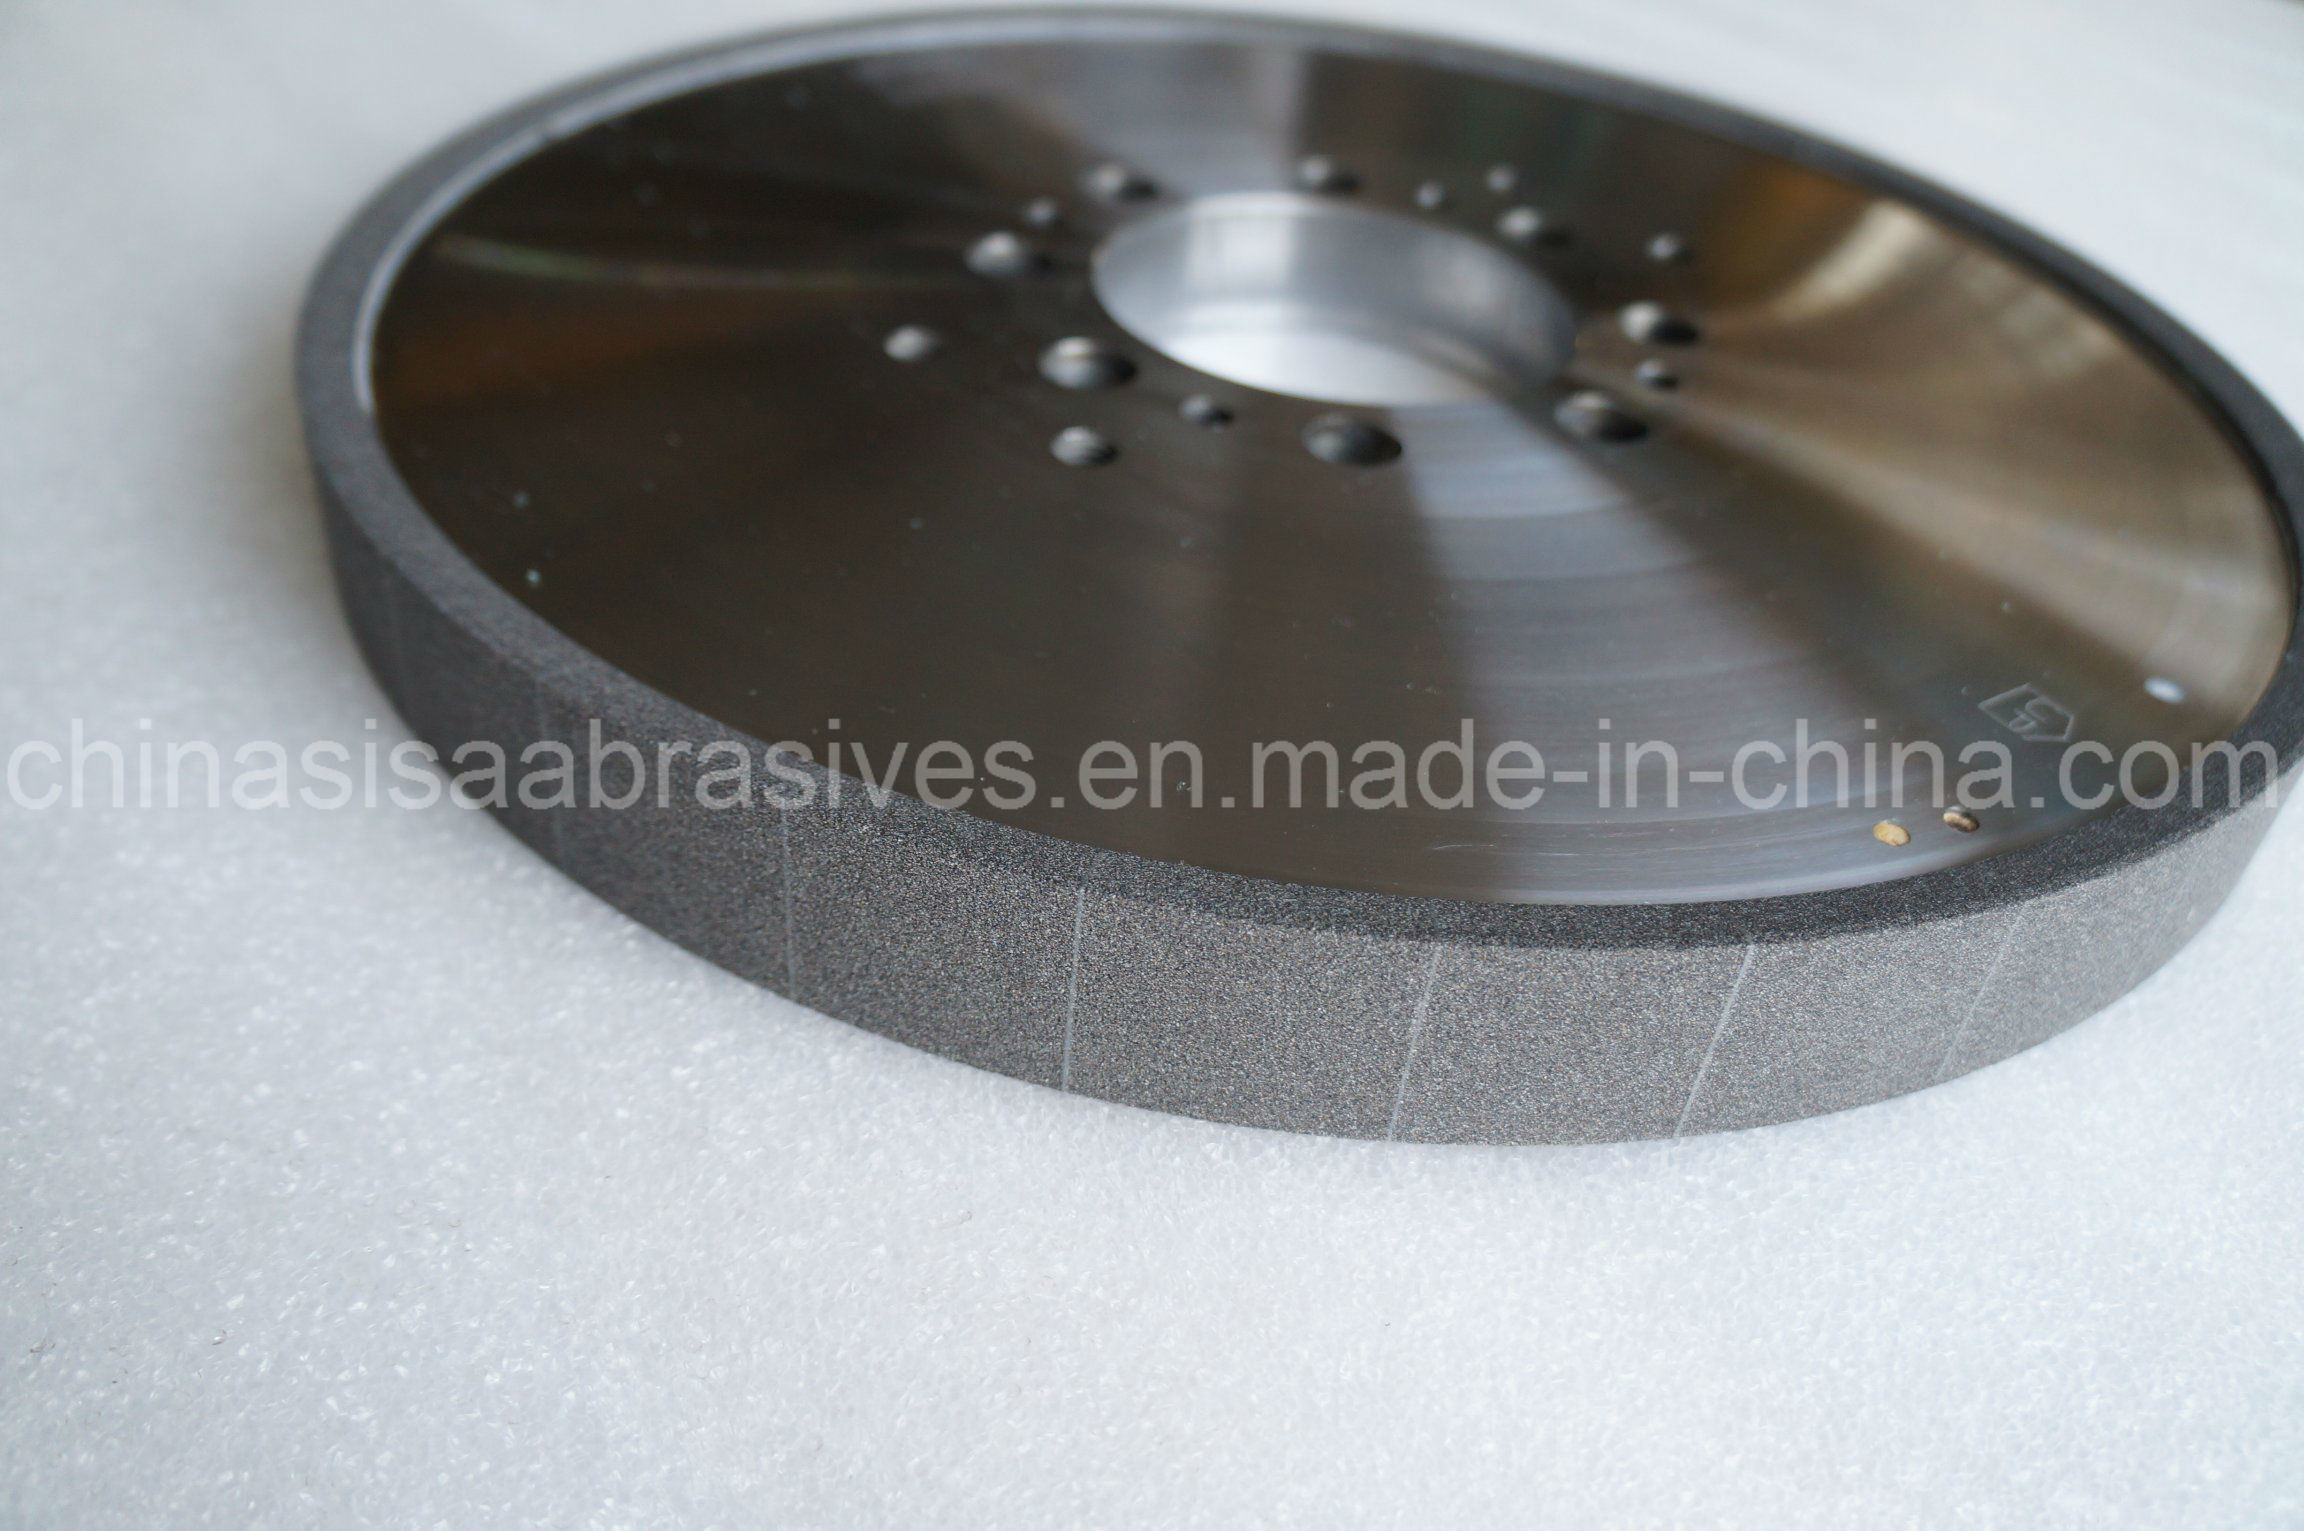 Sisa Premium CBN Grinding Wheel